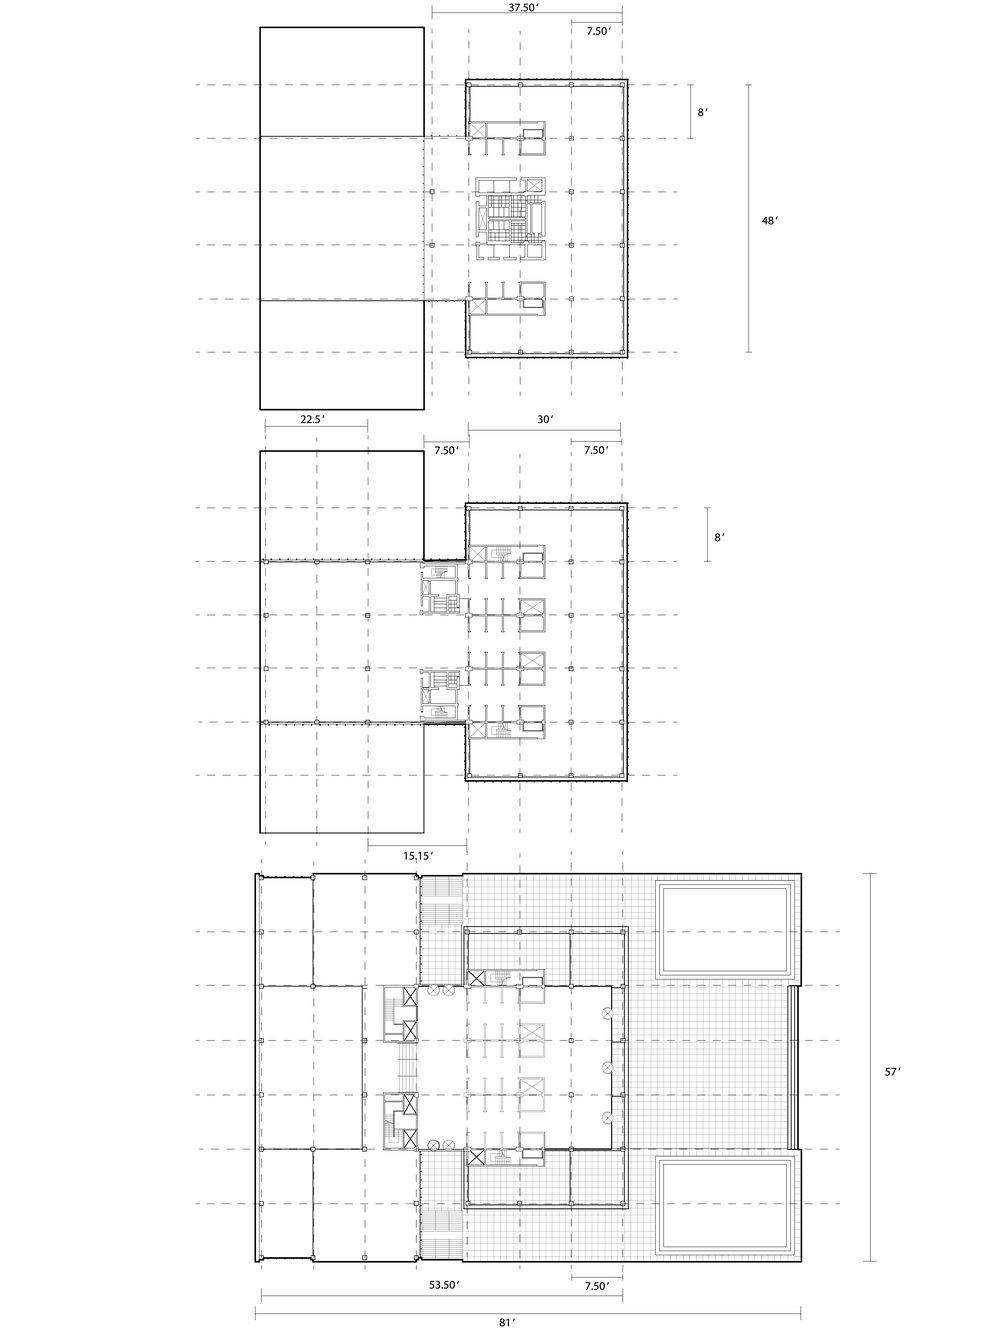 plans gird system.jpg